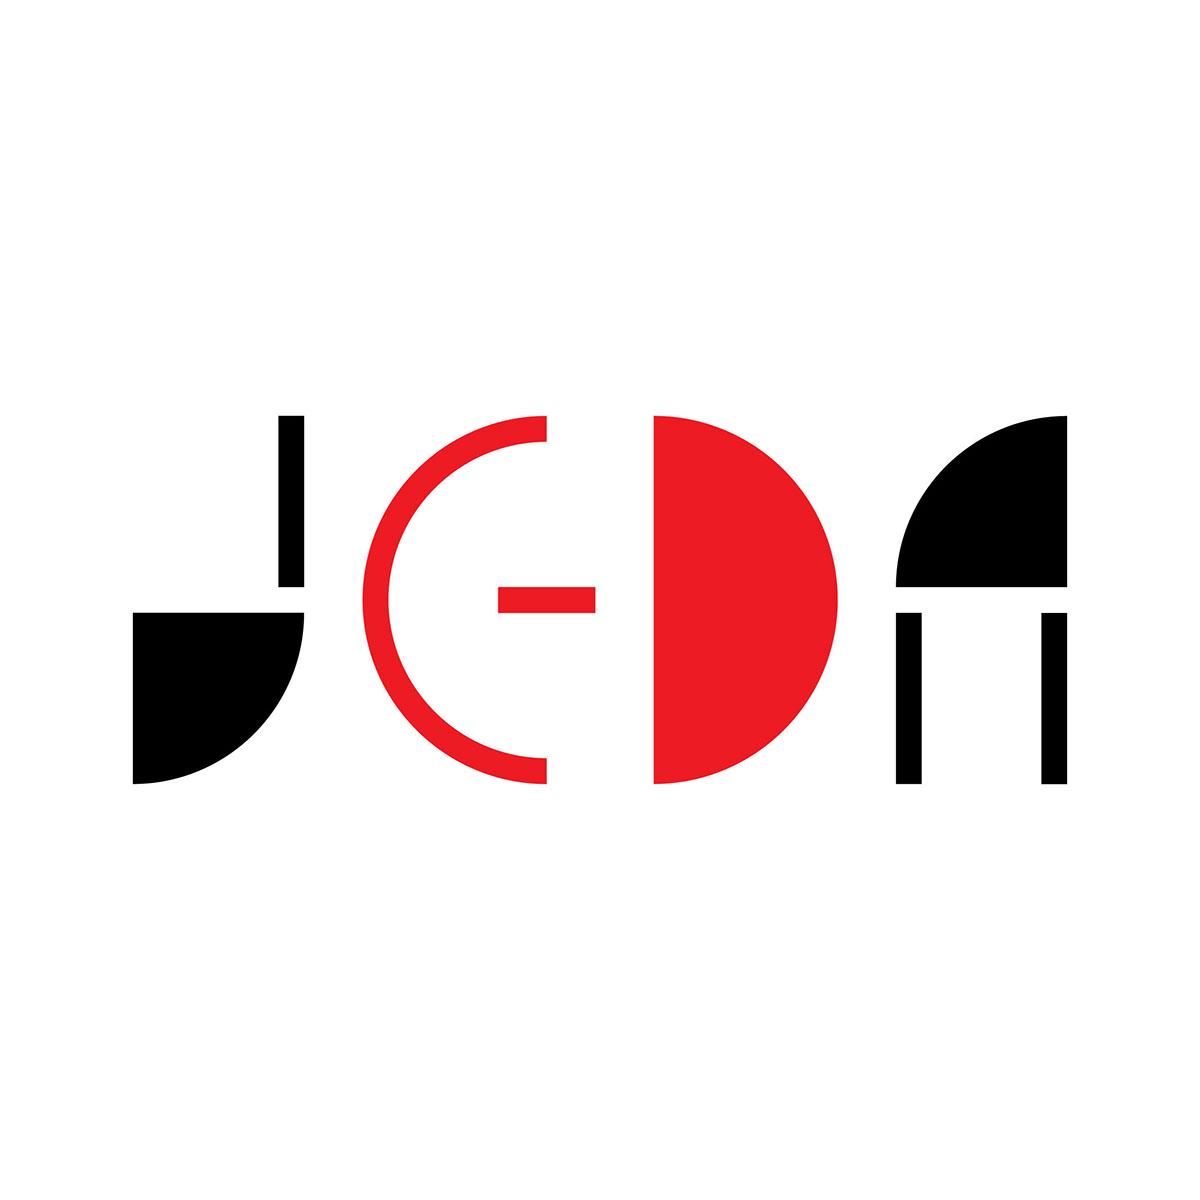 Japanese Graphic Design Association Rebrand On Behance